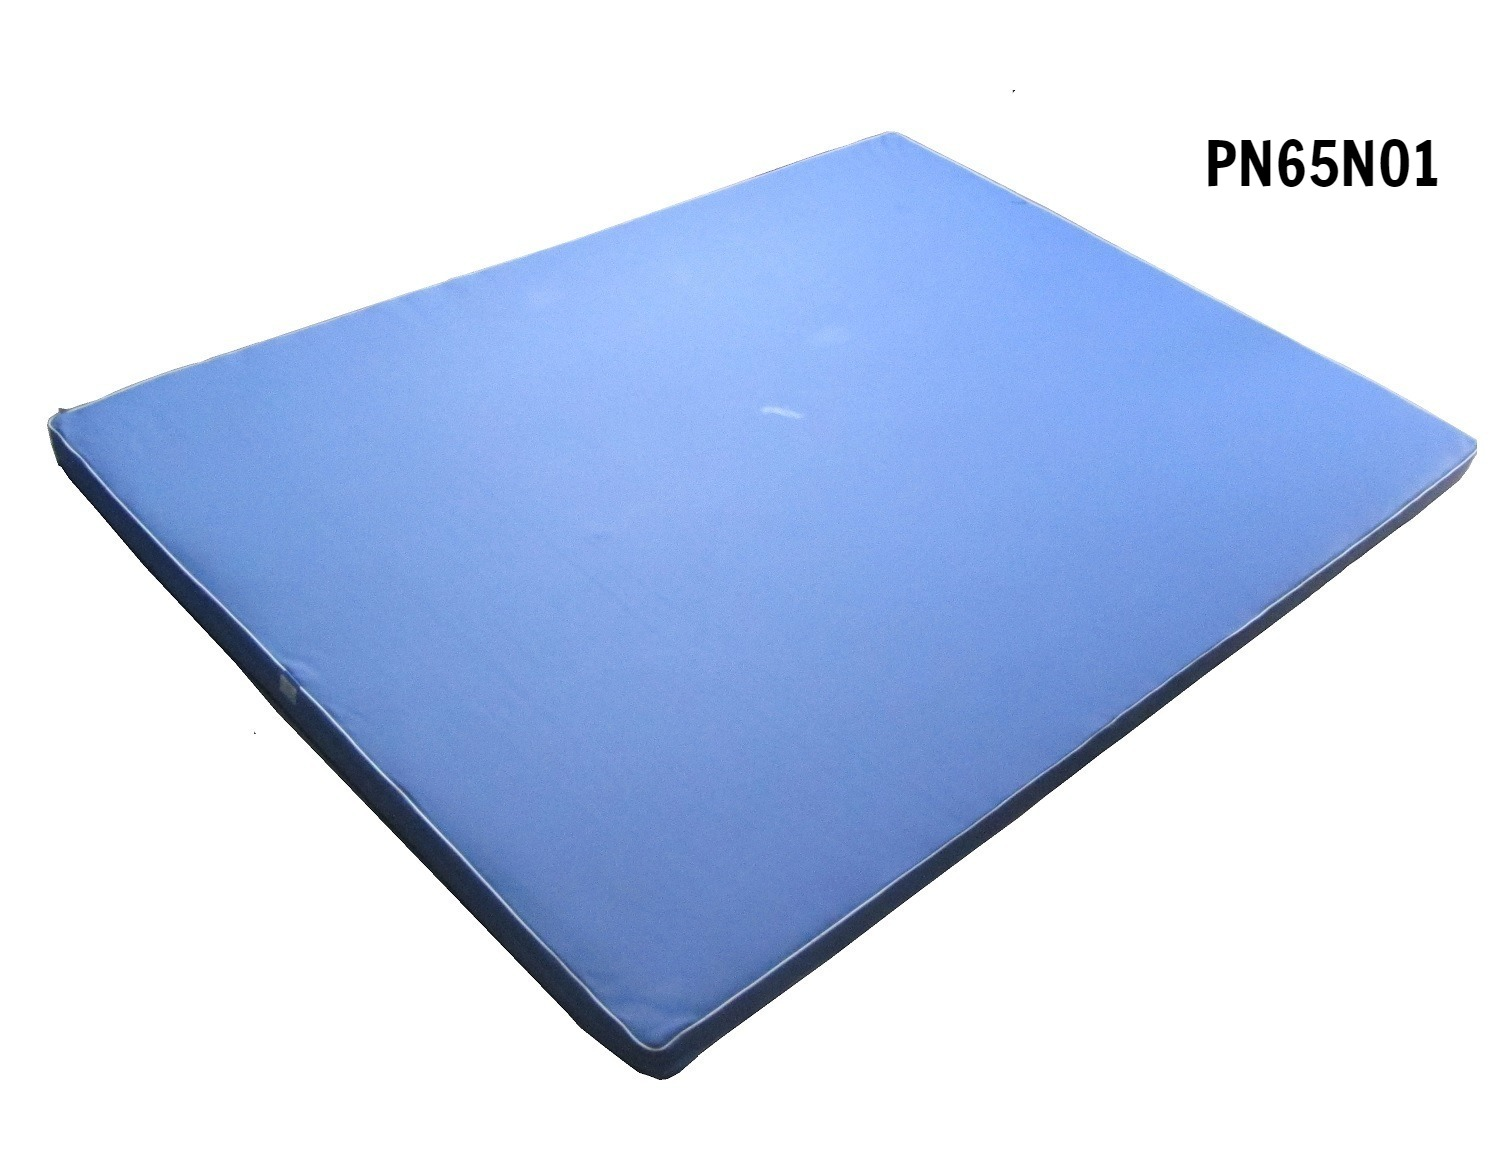 PN65N01 - Nệm tập (190 x 140 cm)